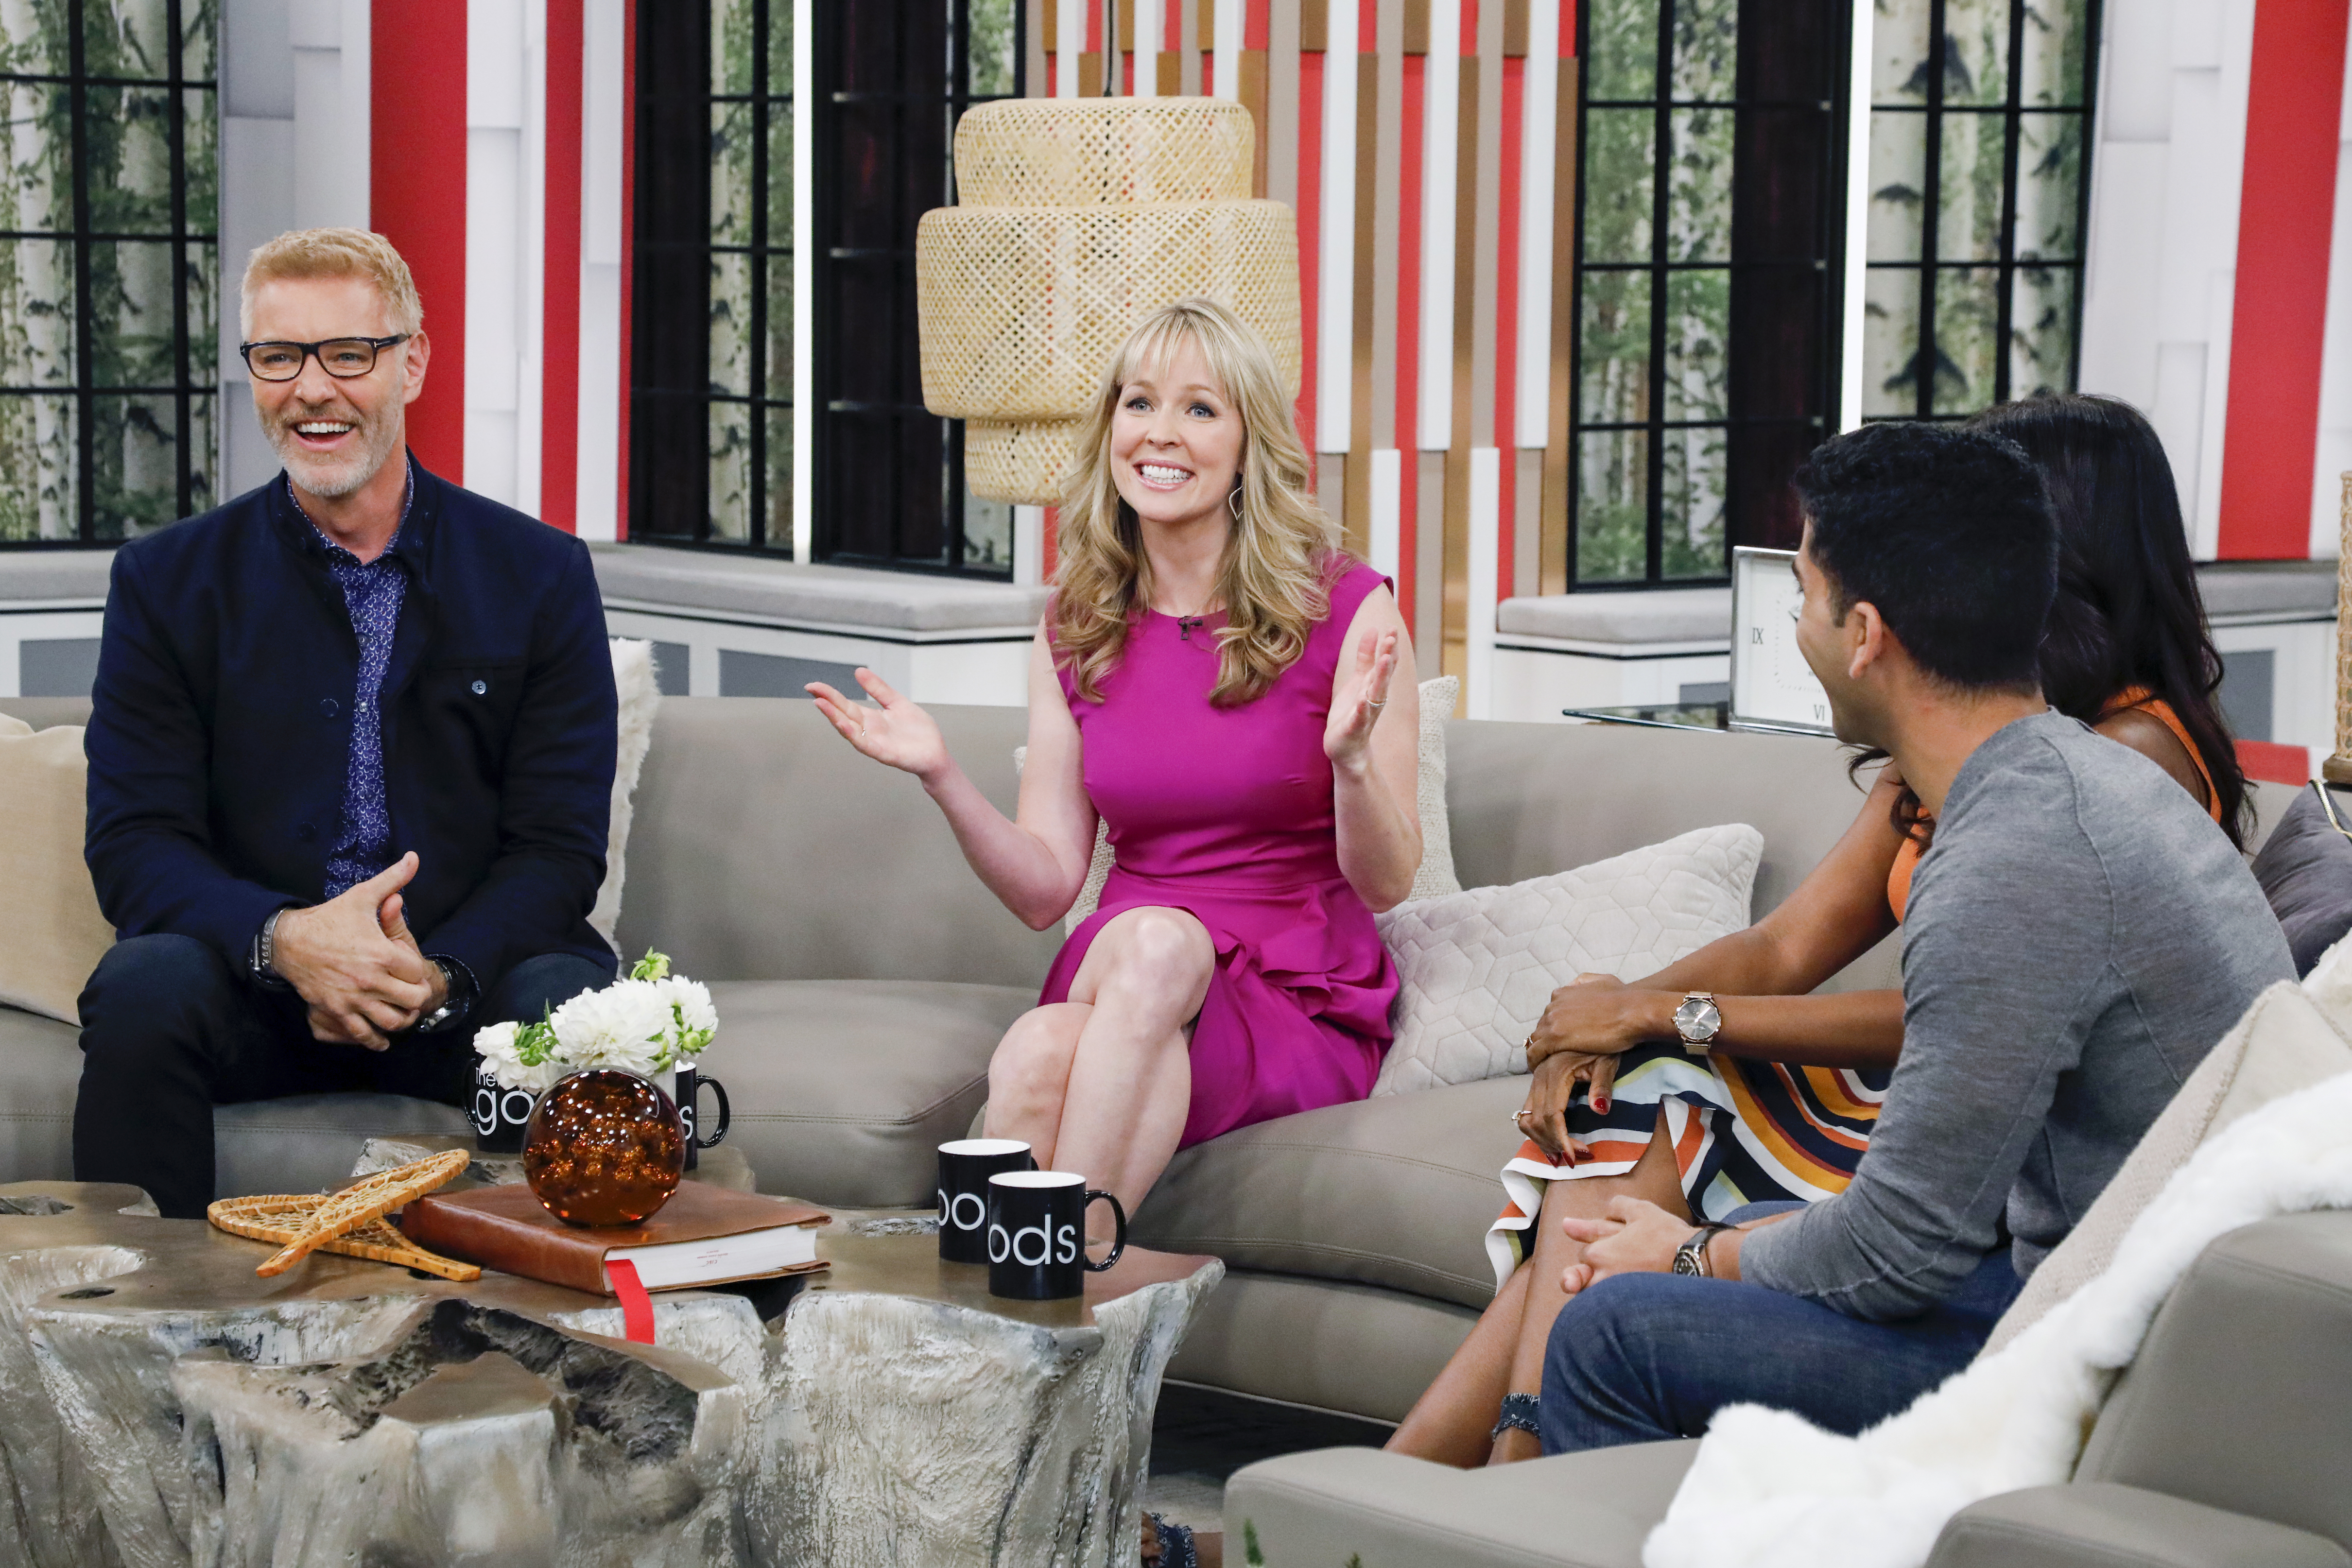 Kelly VanderBeek Guest Host CBC THE GOODS